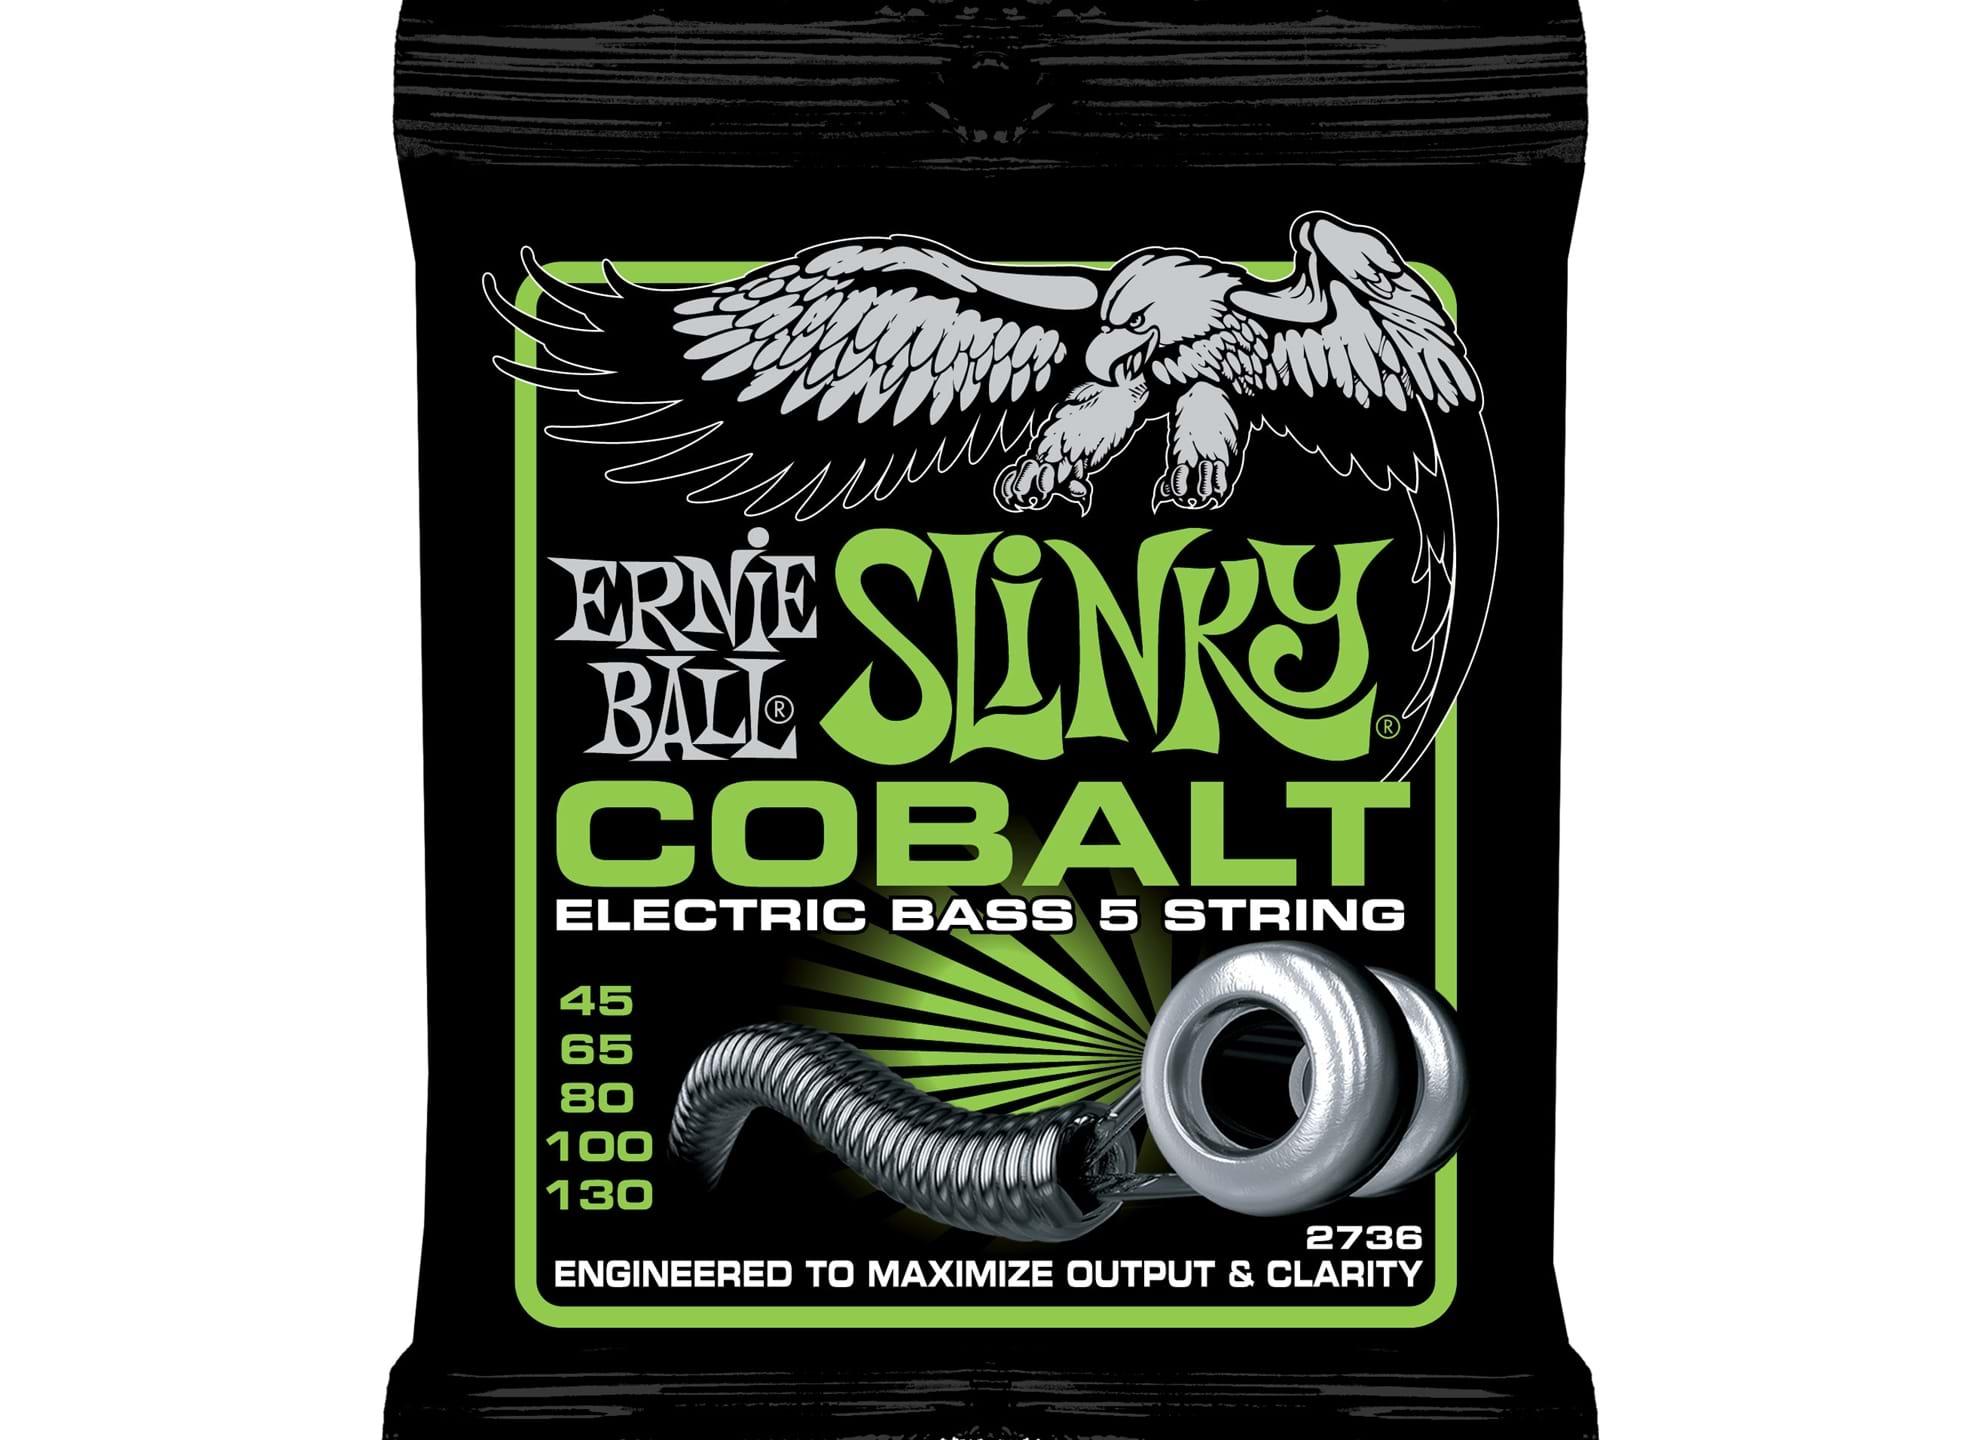 045-130 Regular Slinky Bass 5-string Cobalt 2736